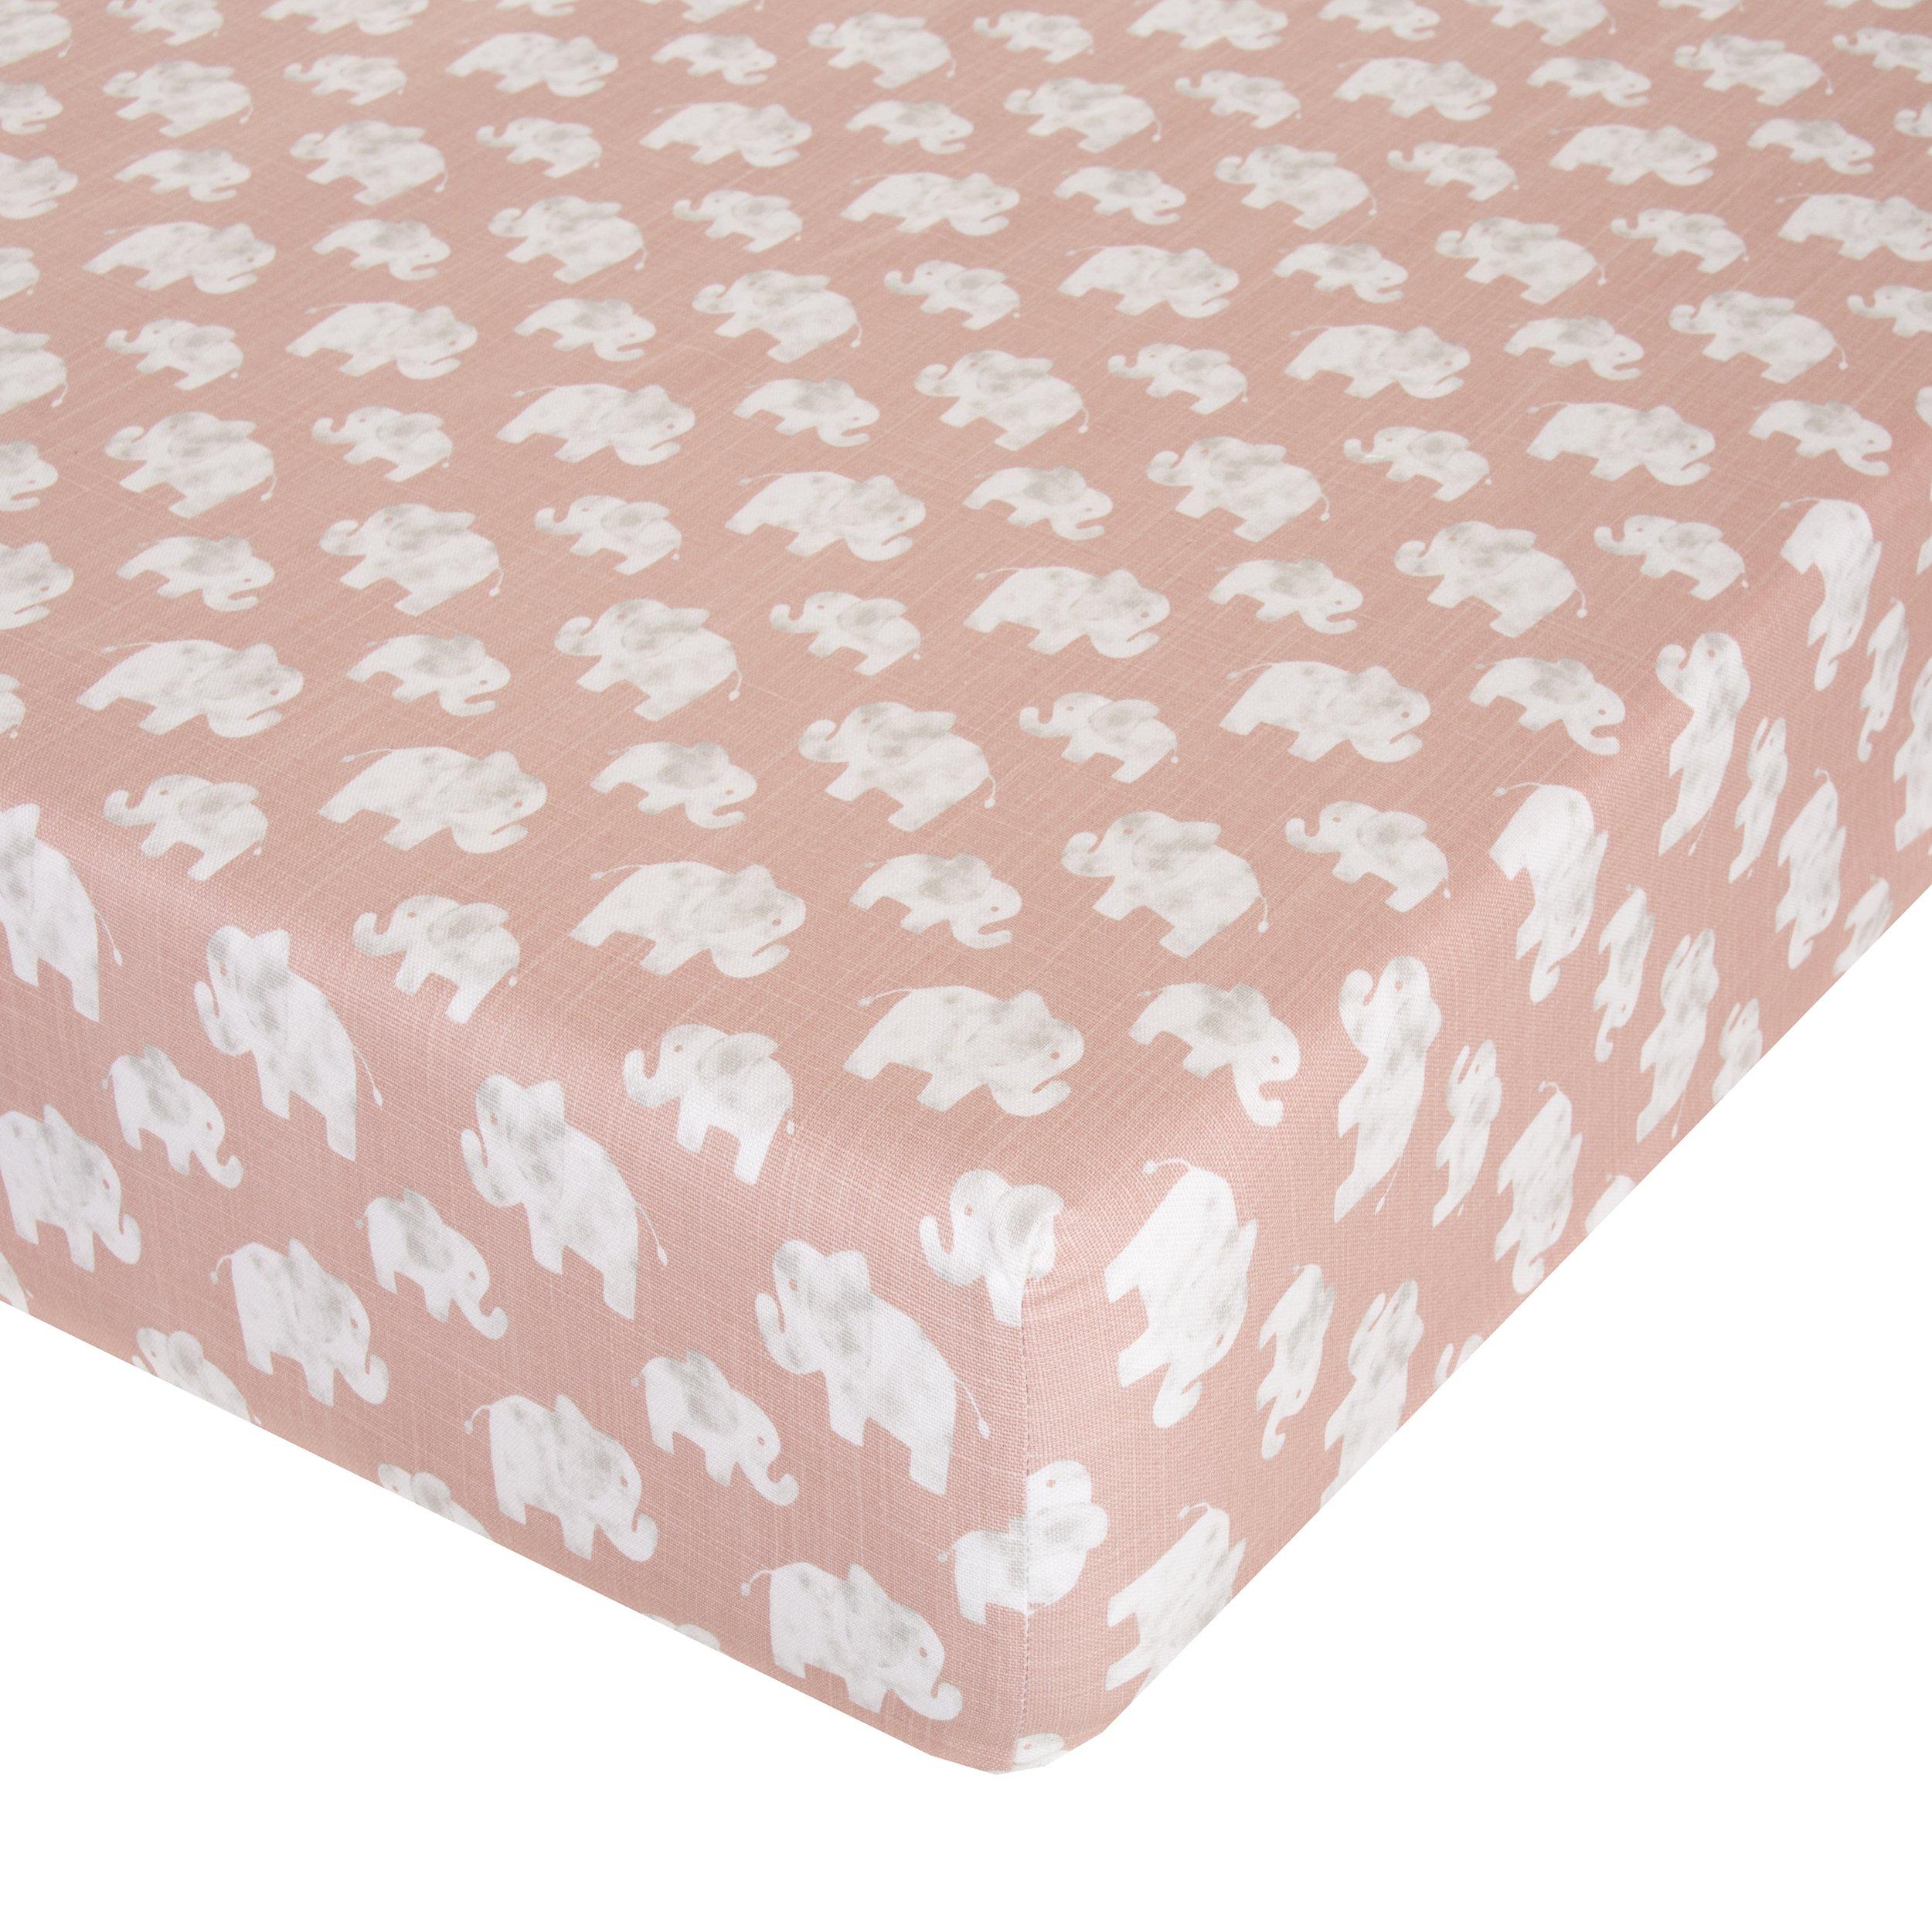 Glenna Jean Elephant Herd - Blush Crib Sheet Fitted 28''x52''x8'' Nursery Standard